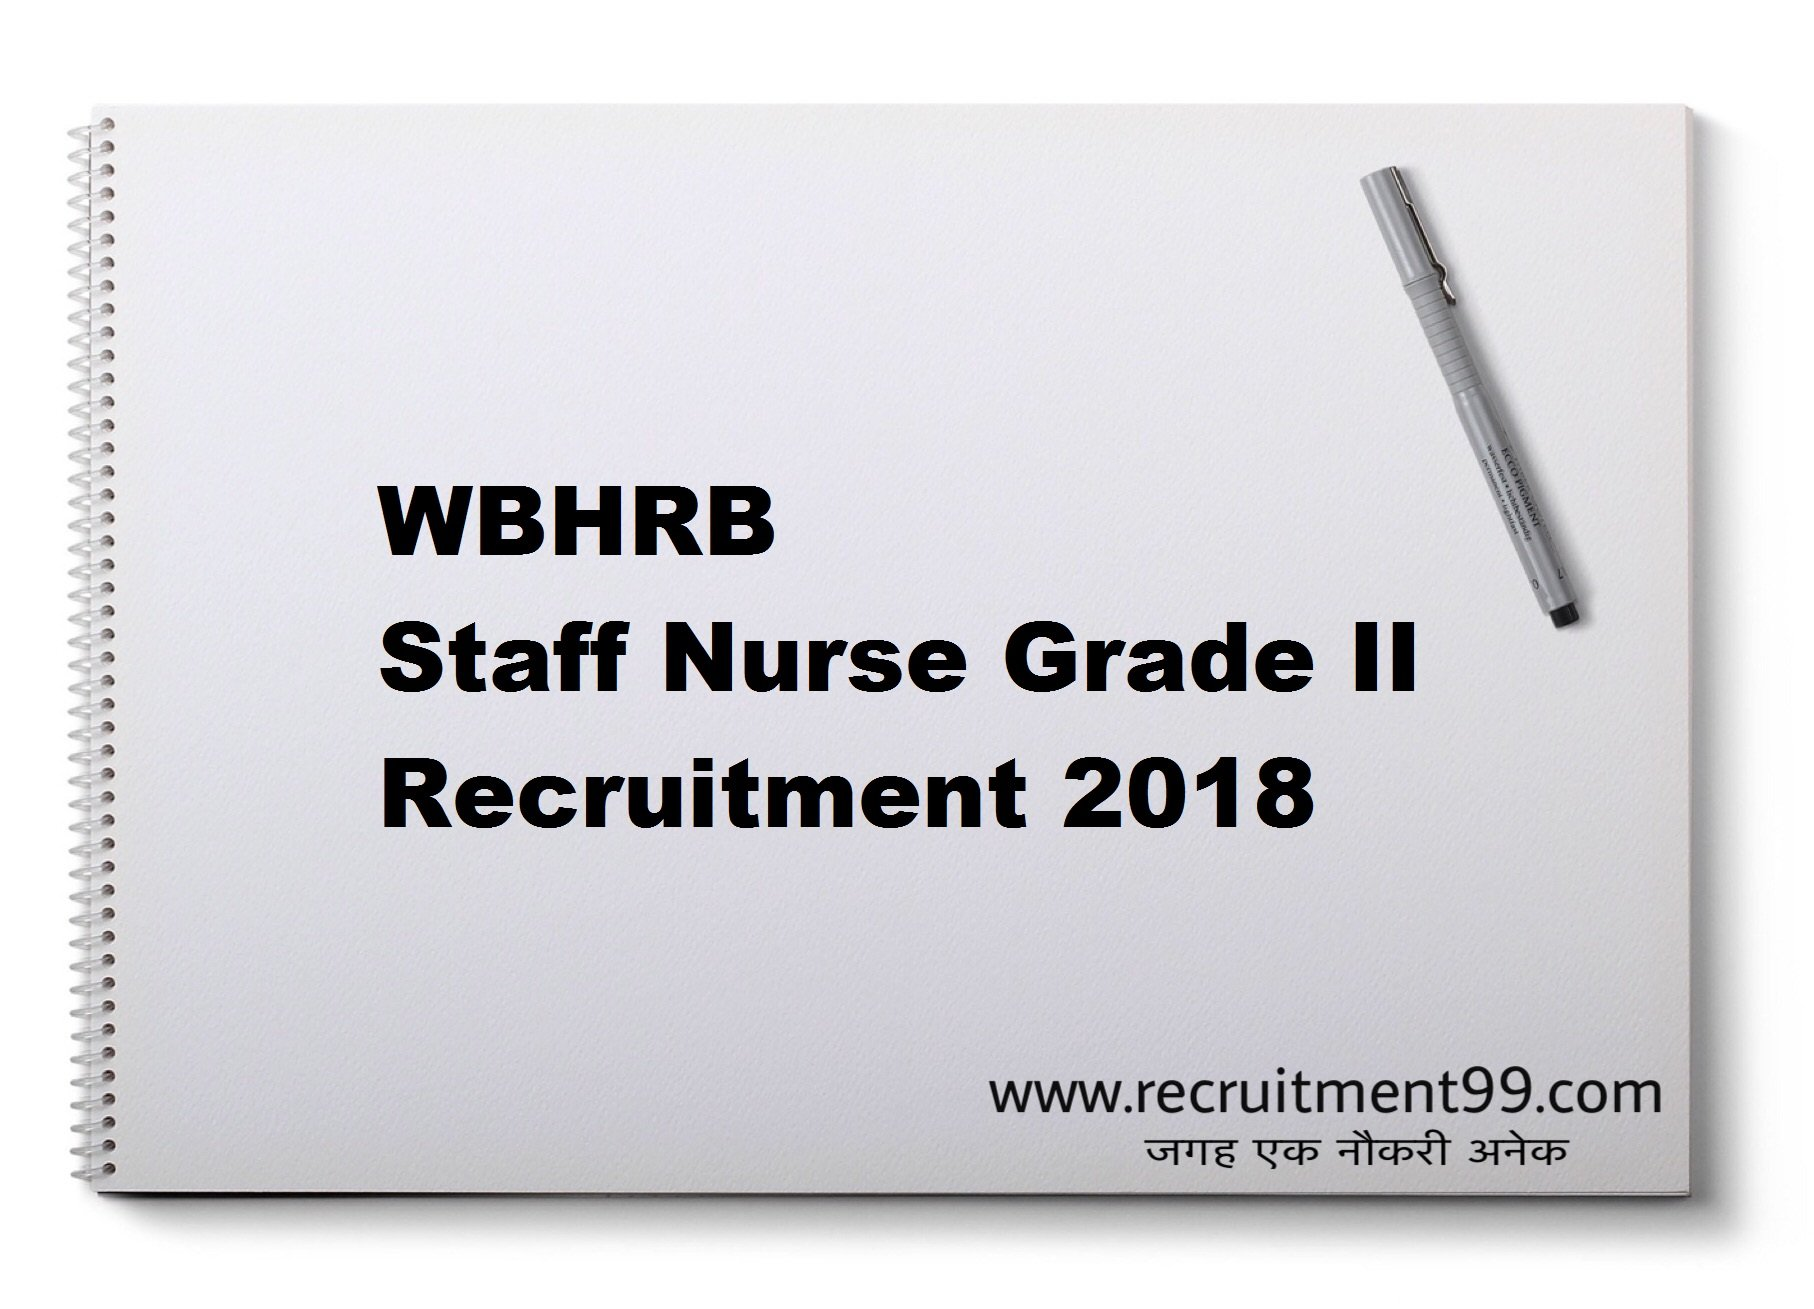 WBHRB Staff Nurse Grade II Recruitment Admit Card Result 2018